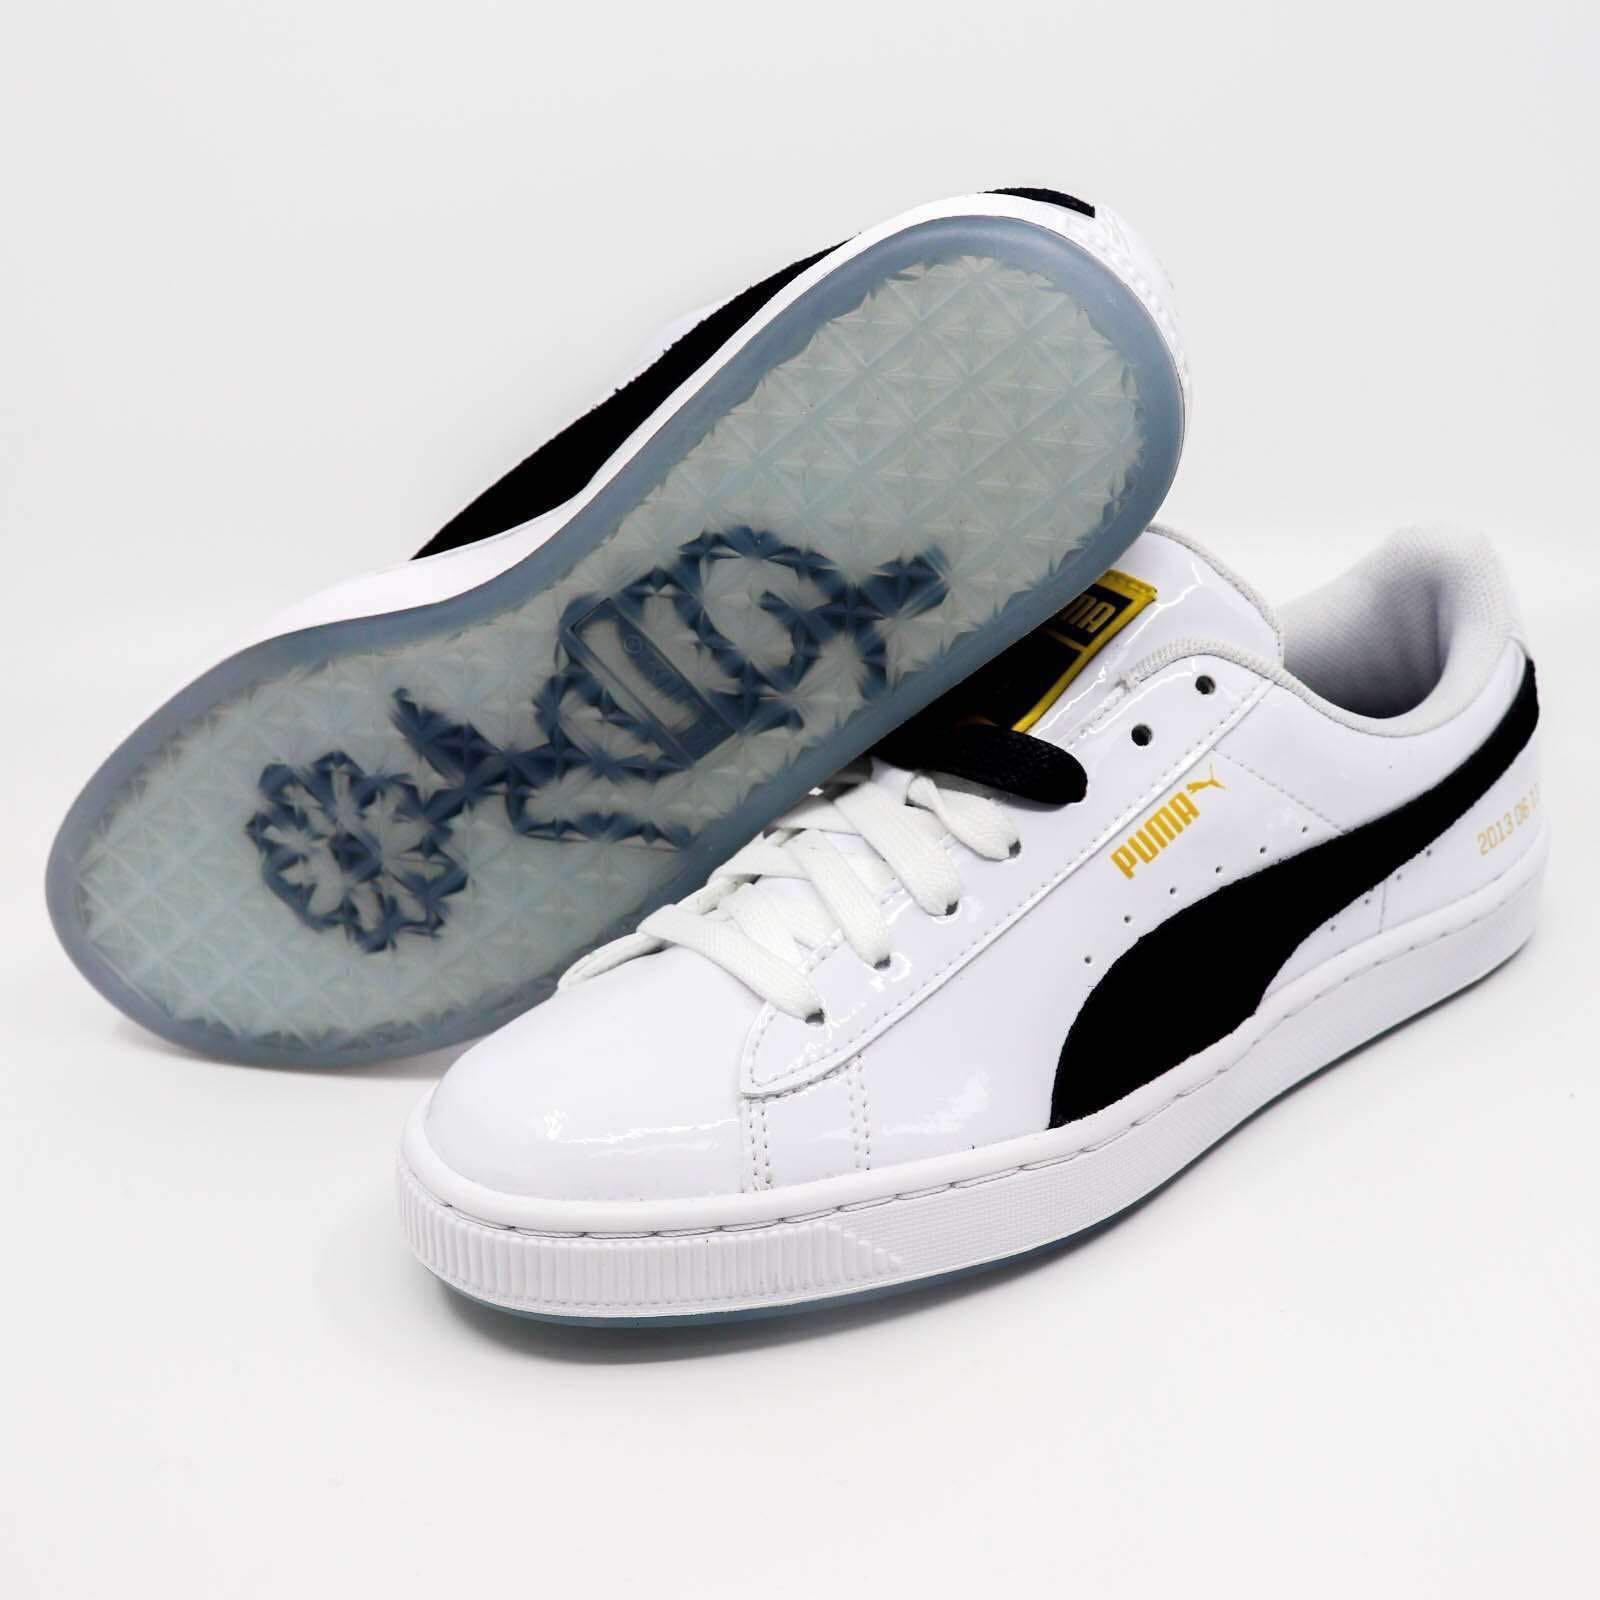 PUMA x BTS Basket Patent Sneakers, Men